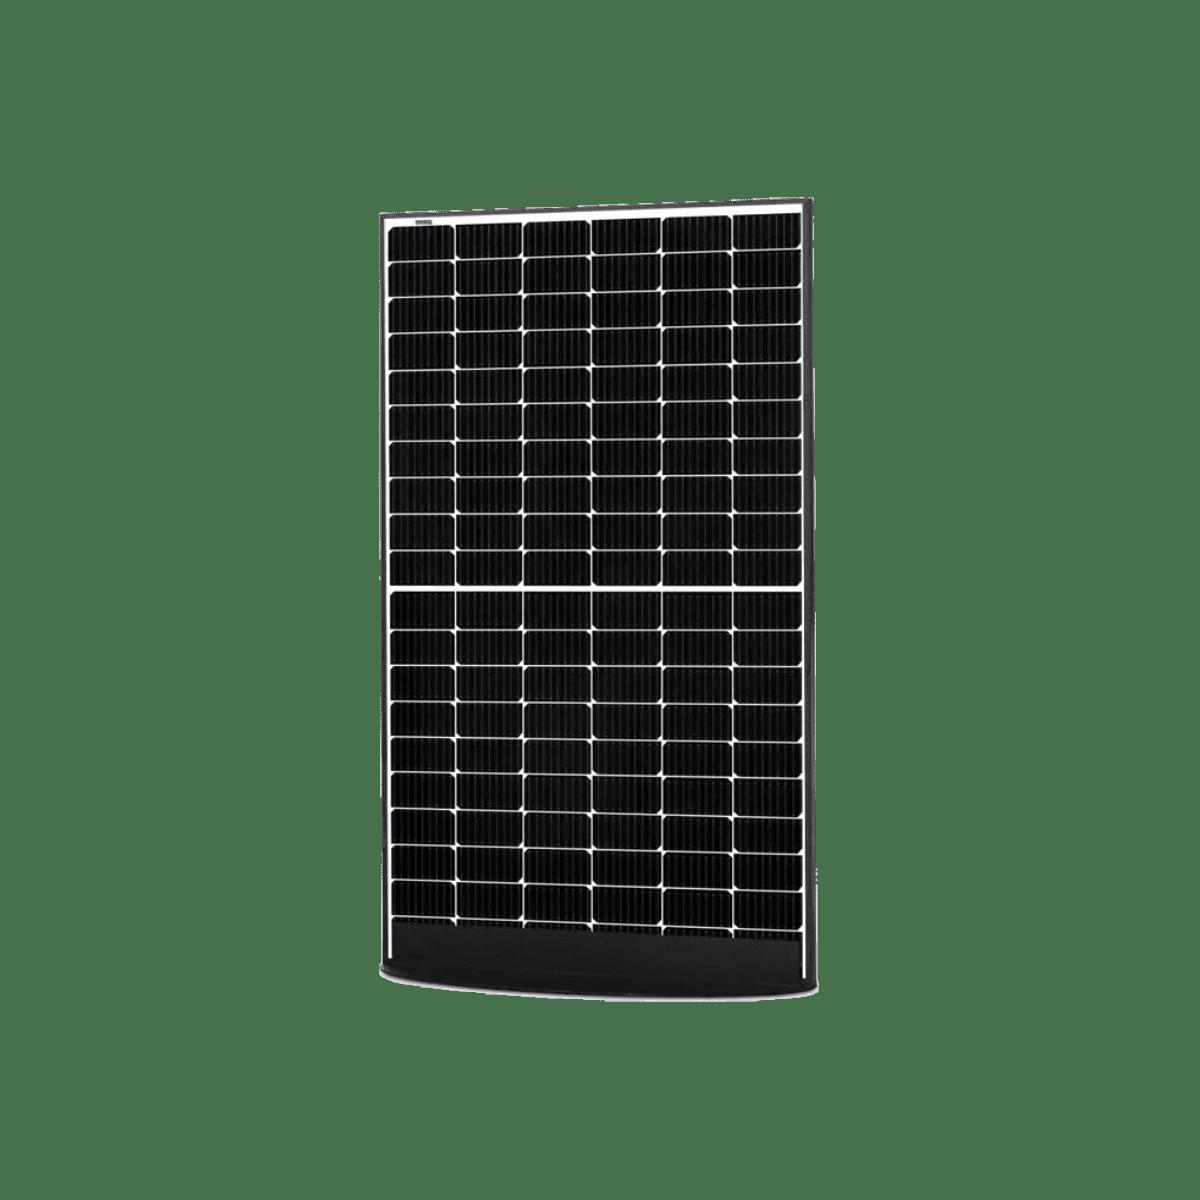 SoliTek Standard HalfCut 120 cells 370W solar panel front